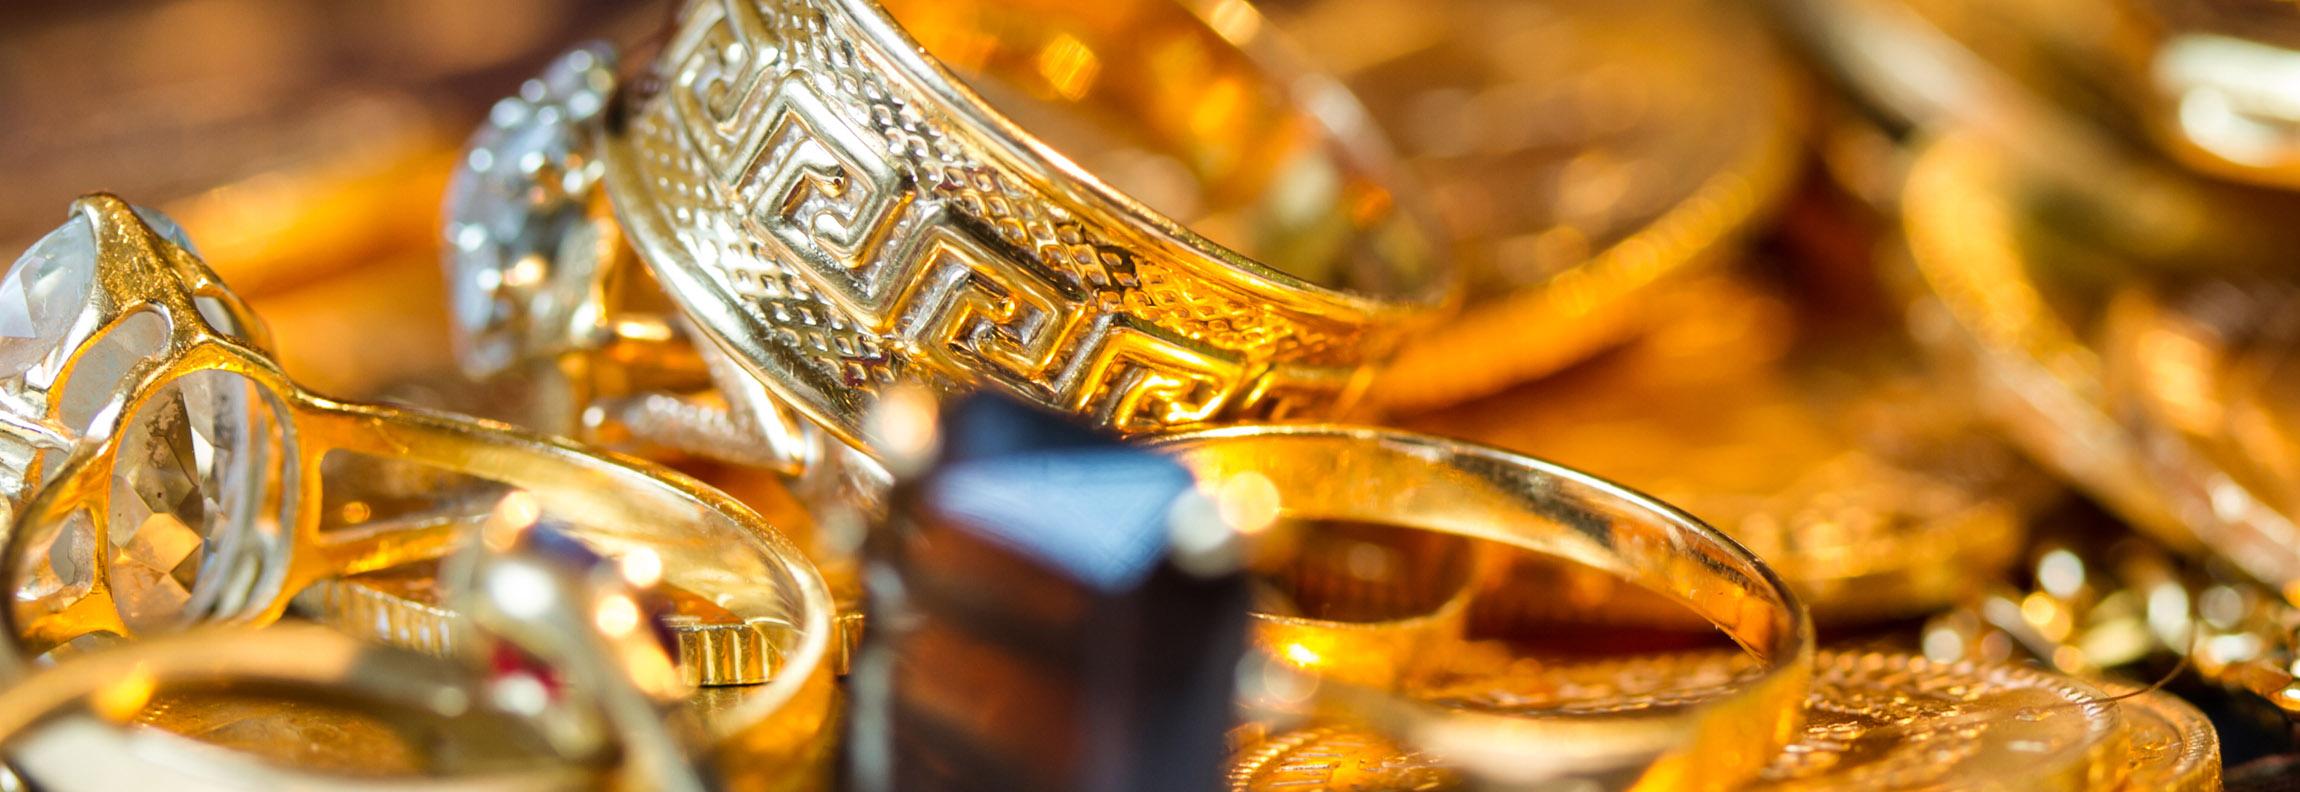 Joseph's Fine Jewelry - Gold Buying